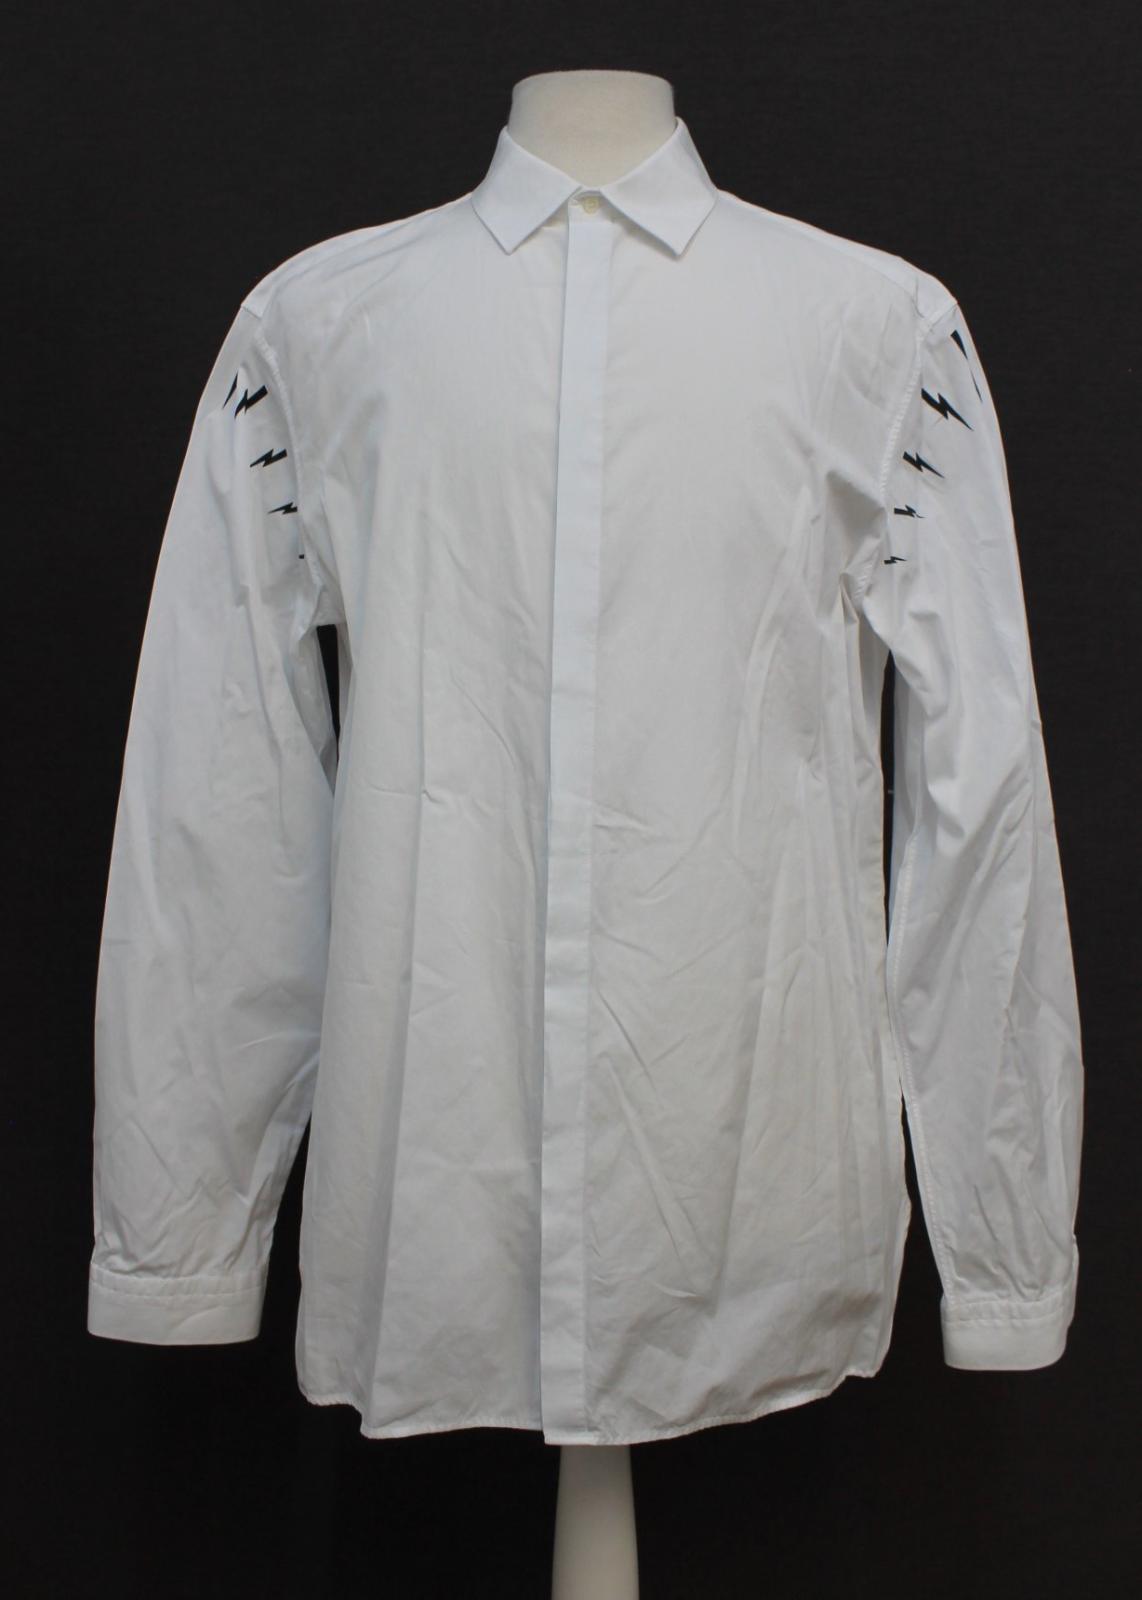 Neil-barrett-hombre-blanco-de-algodon-manga-de-Rayo-con-cuello-camisa-tamano-17-5-034 miniatura 2